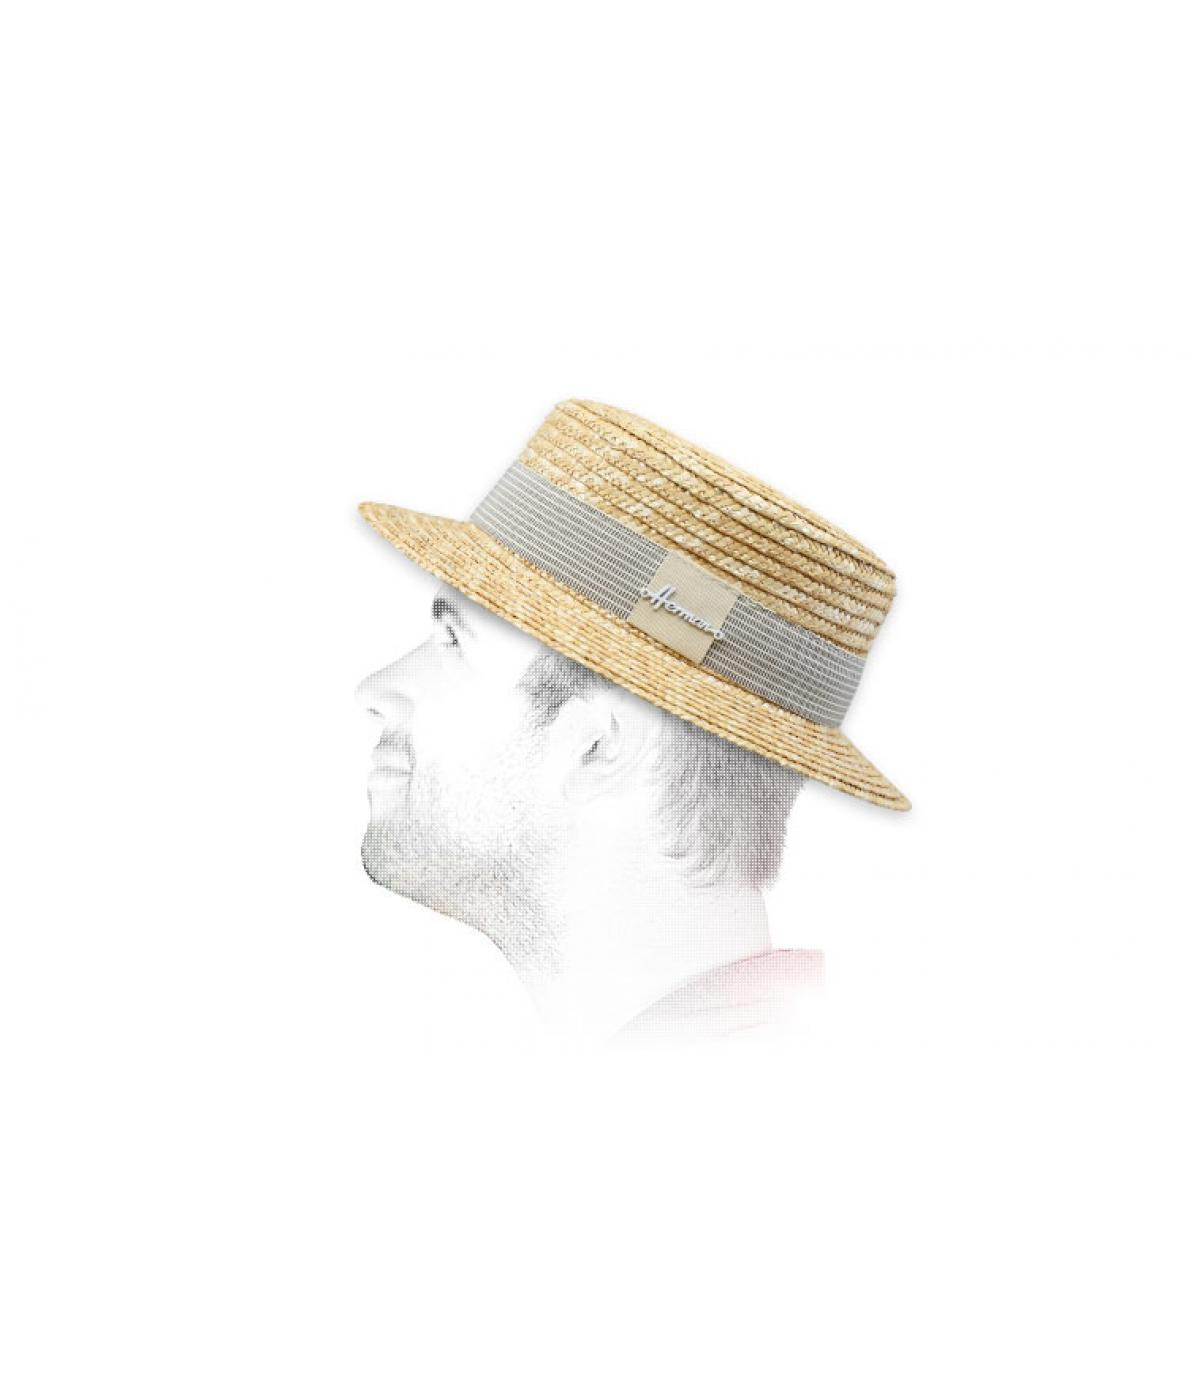 Canotier Strohhut Hutband beige